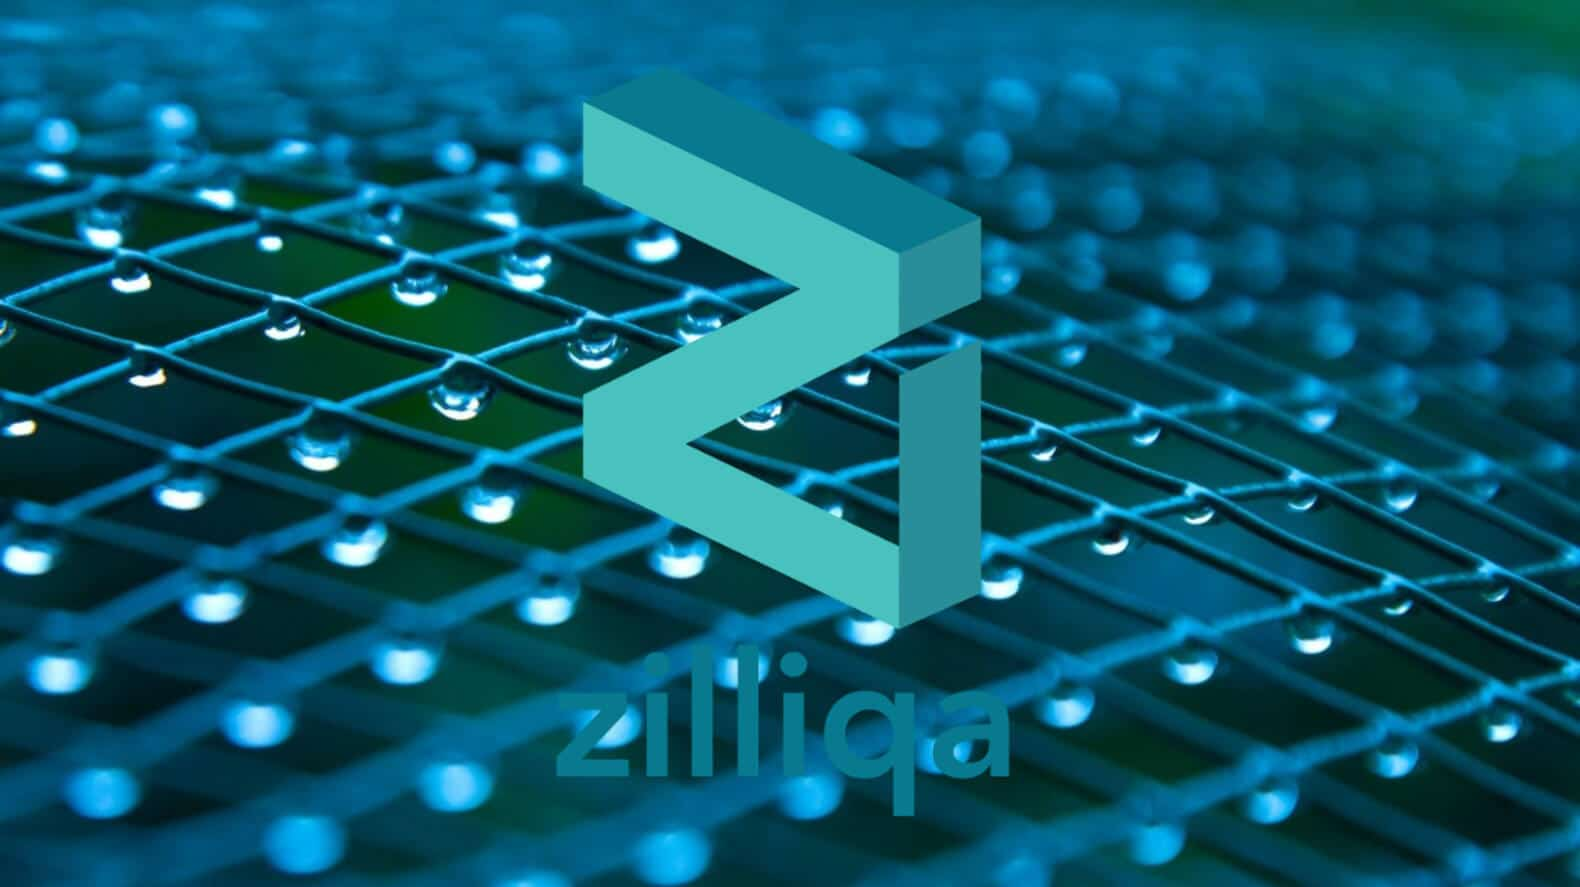 Certificates land on the Zilliqa blockchain